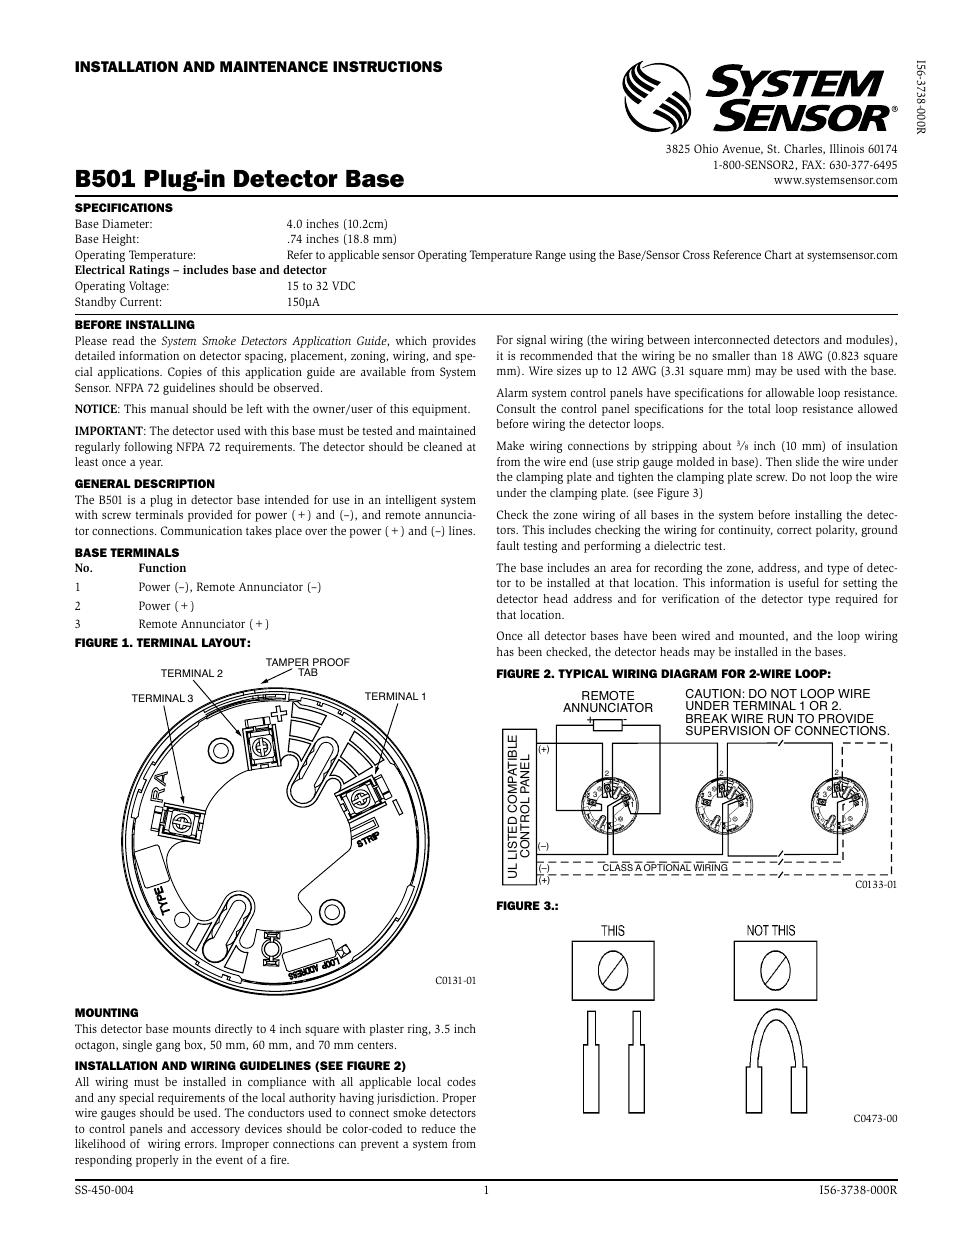 system sensor smoke detector wiring diagram honeywell notifier nfs 320 b501 user manual 2 pages